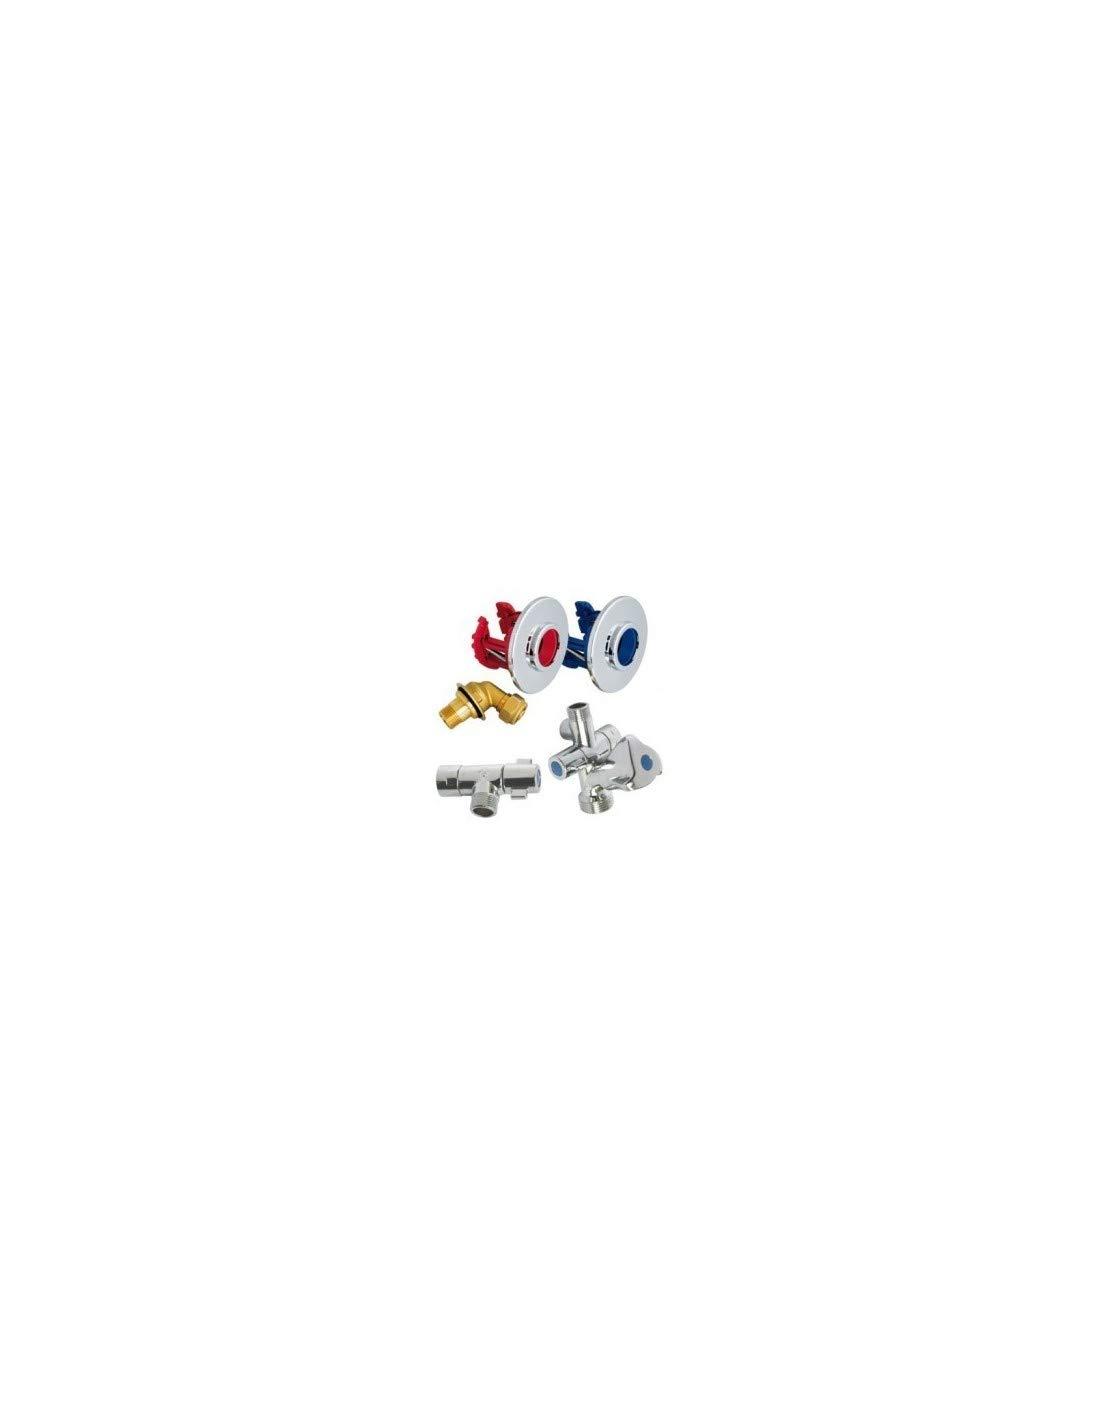 Kit FIXOPLAC raccord à compression pour lavabo PER 13/16 - Somatherm 3540737808748